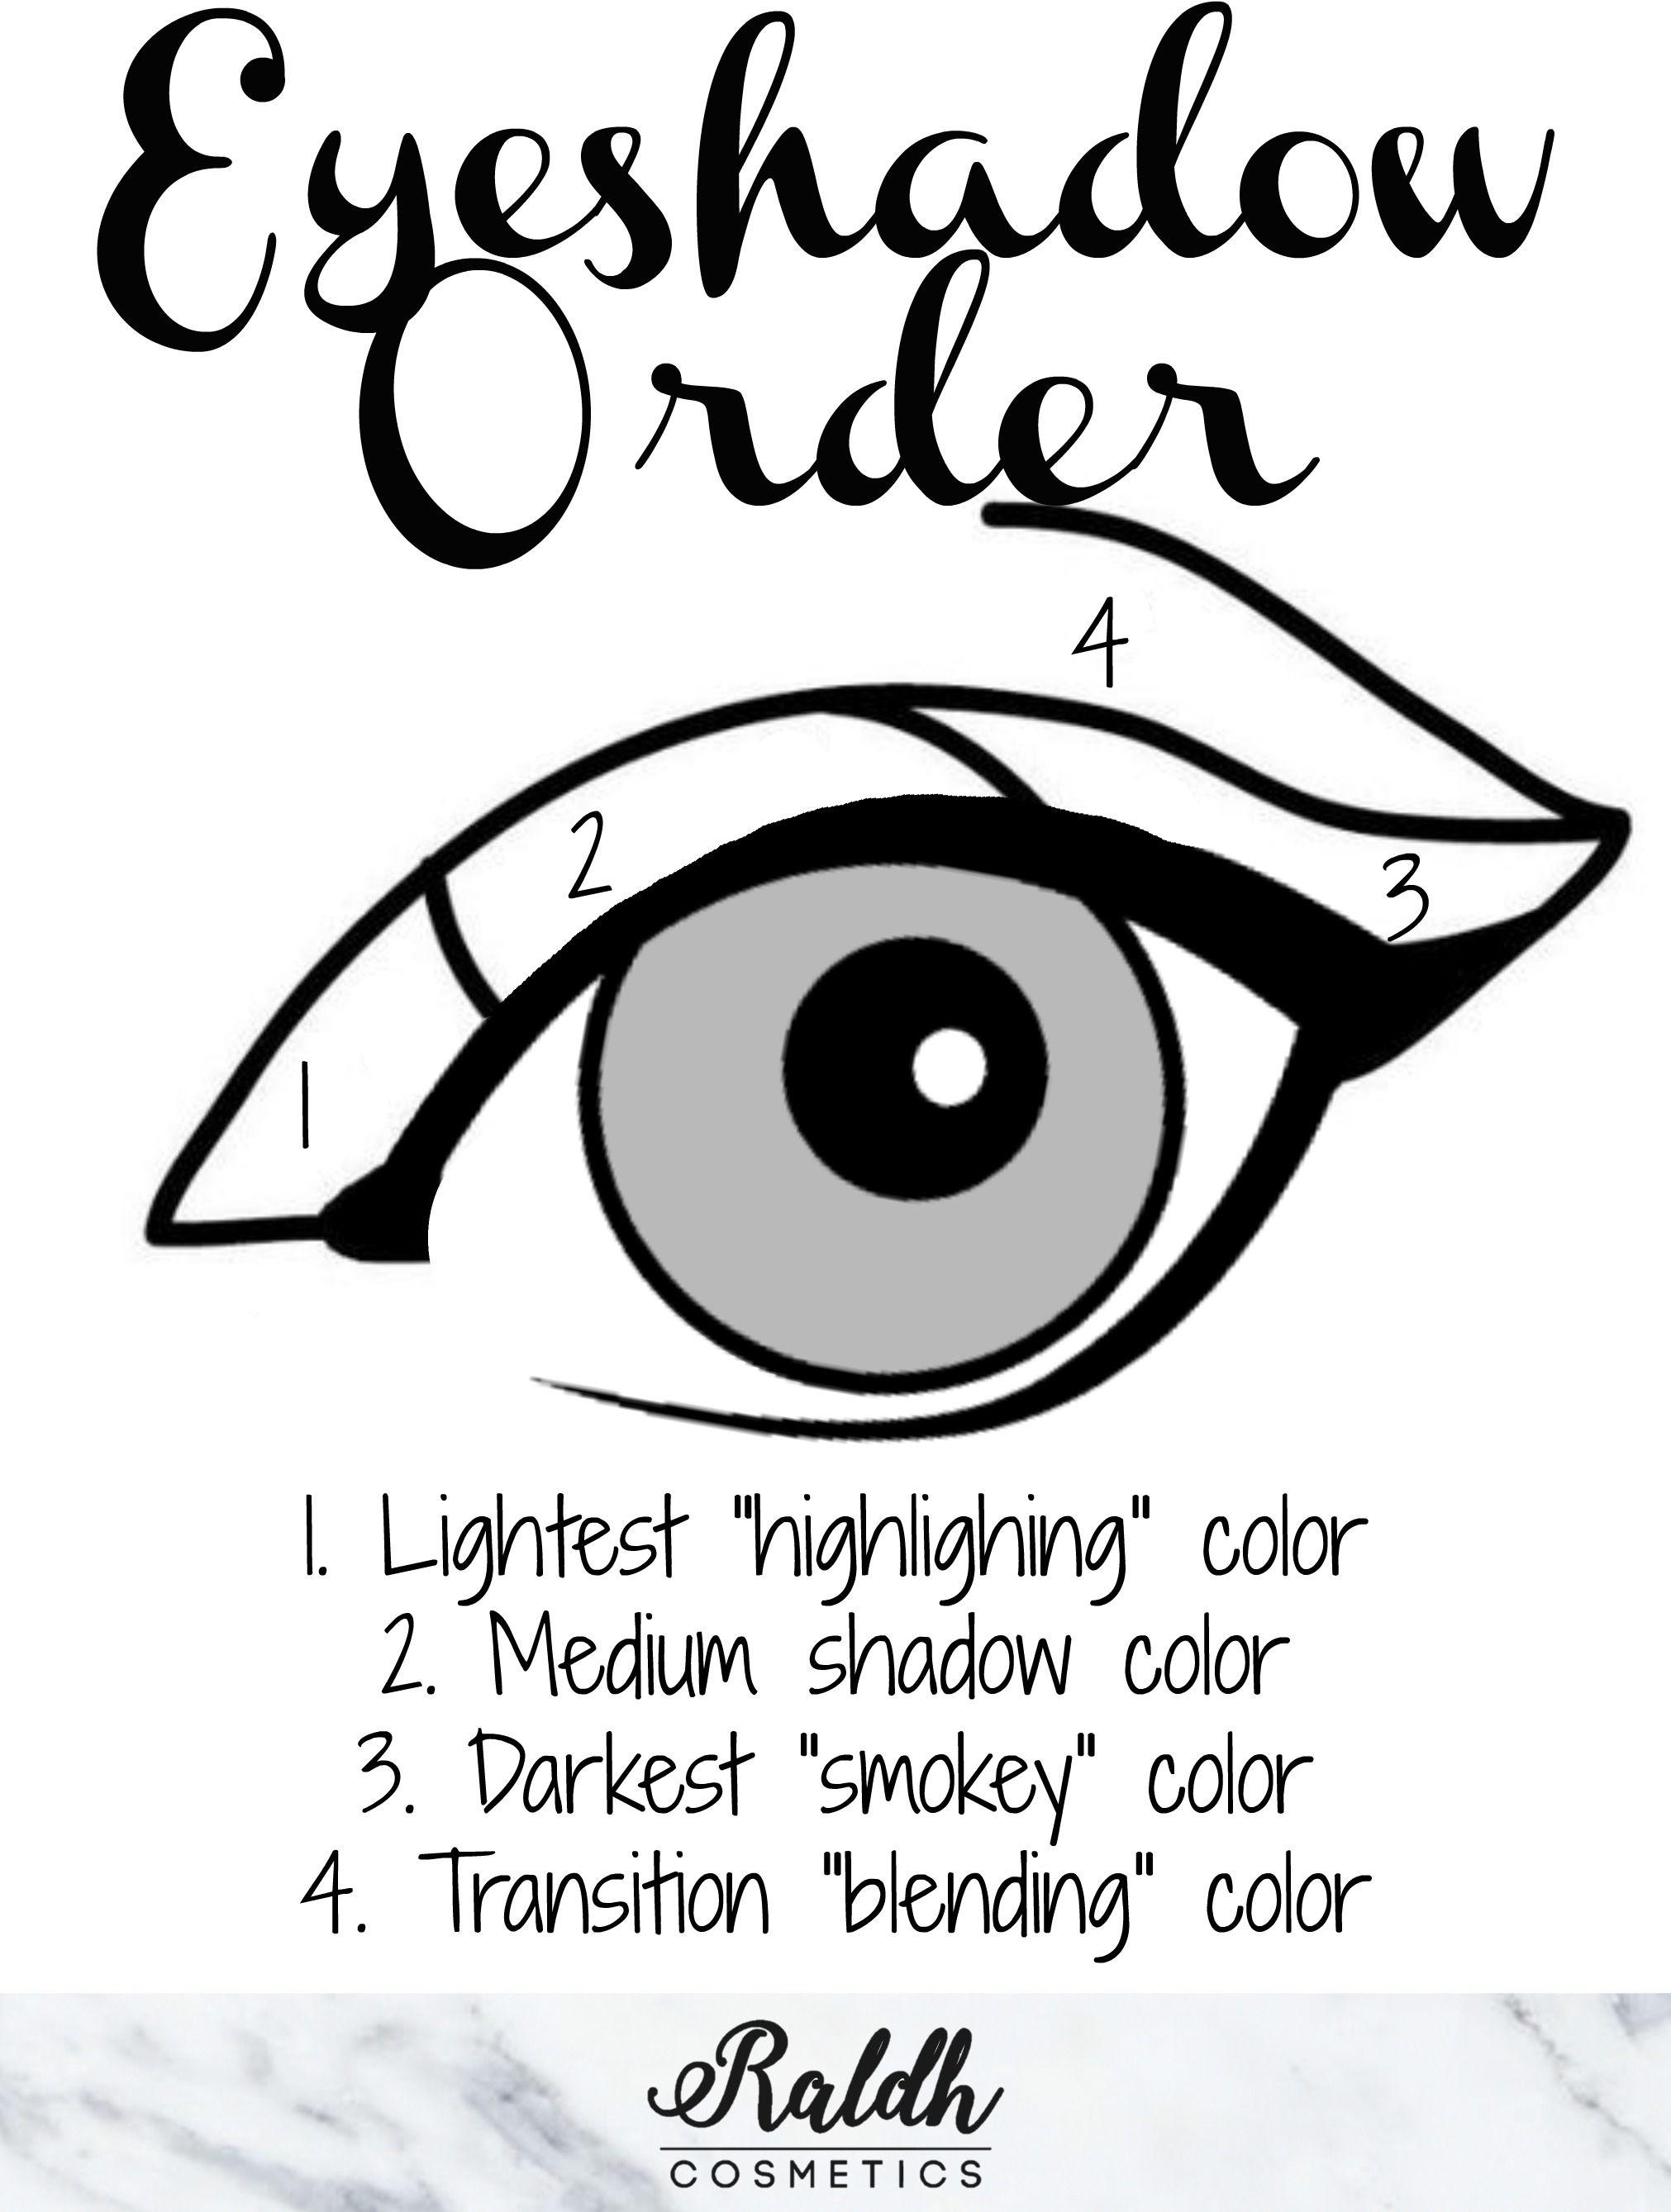 Eyeshadow order RaldhCosmetics MakeupTips MakeupHacks